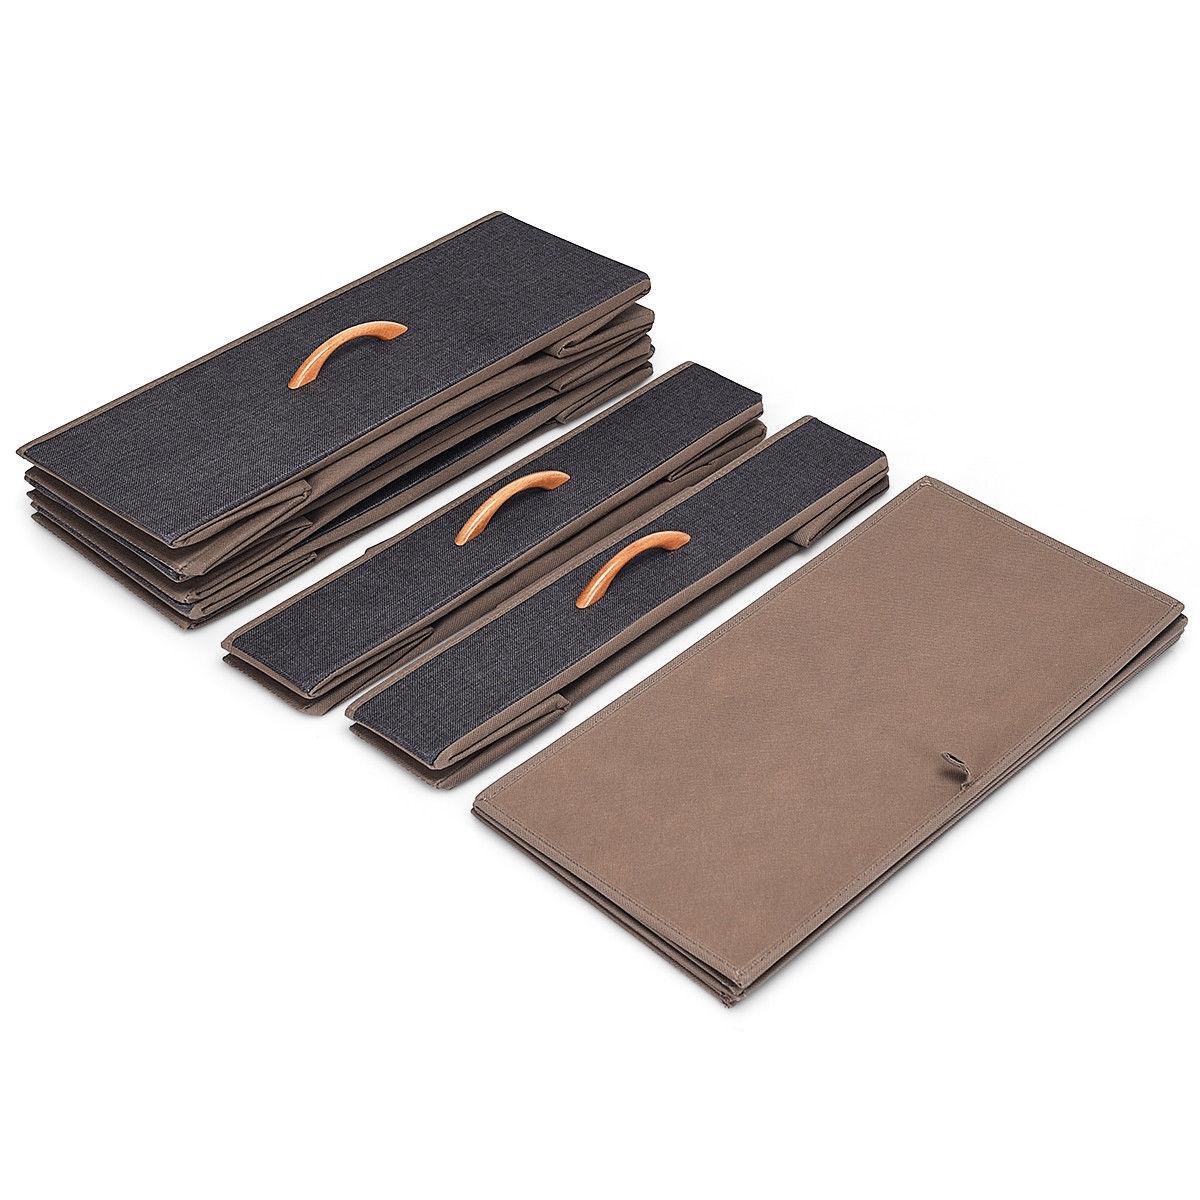 5-Drawer Fabric Metal Frame Dresser Storage Organizer with Wheel